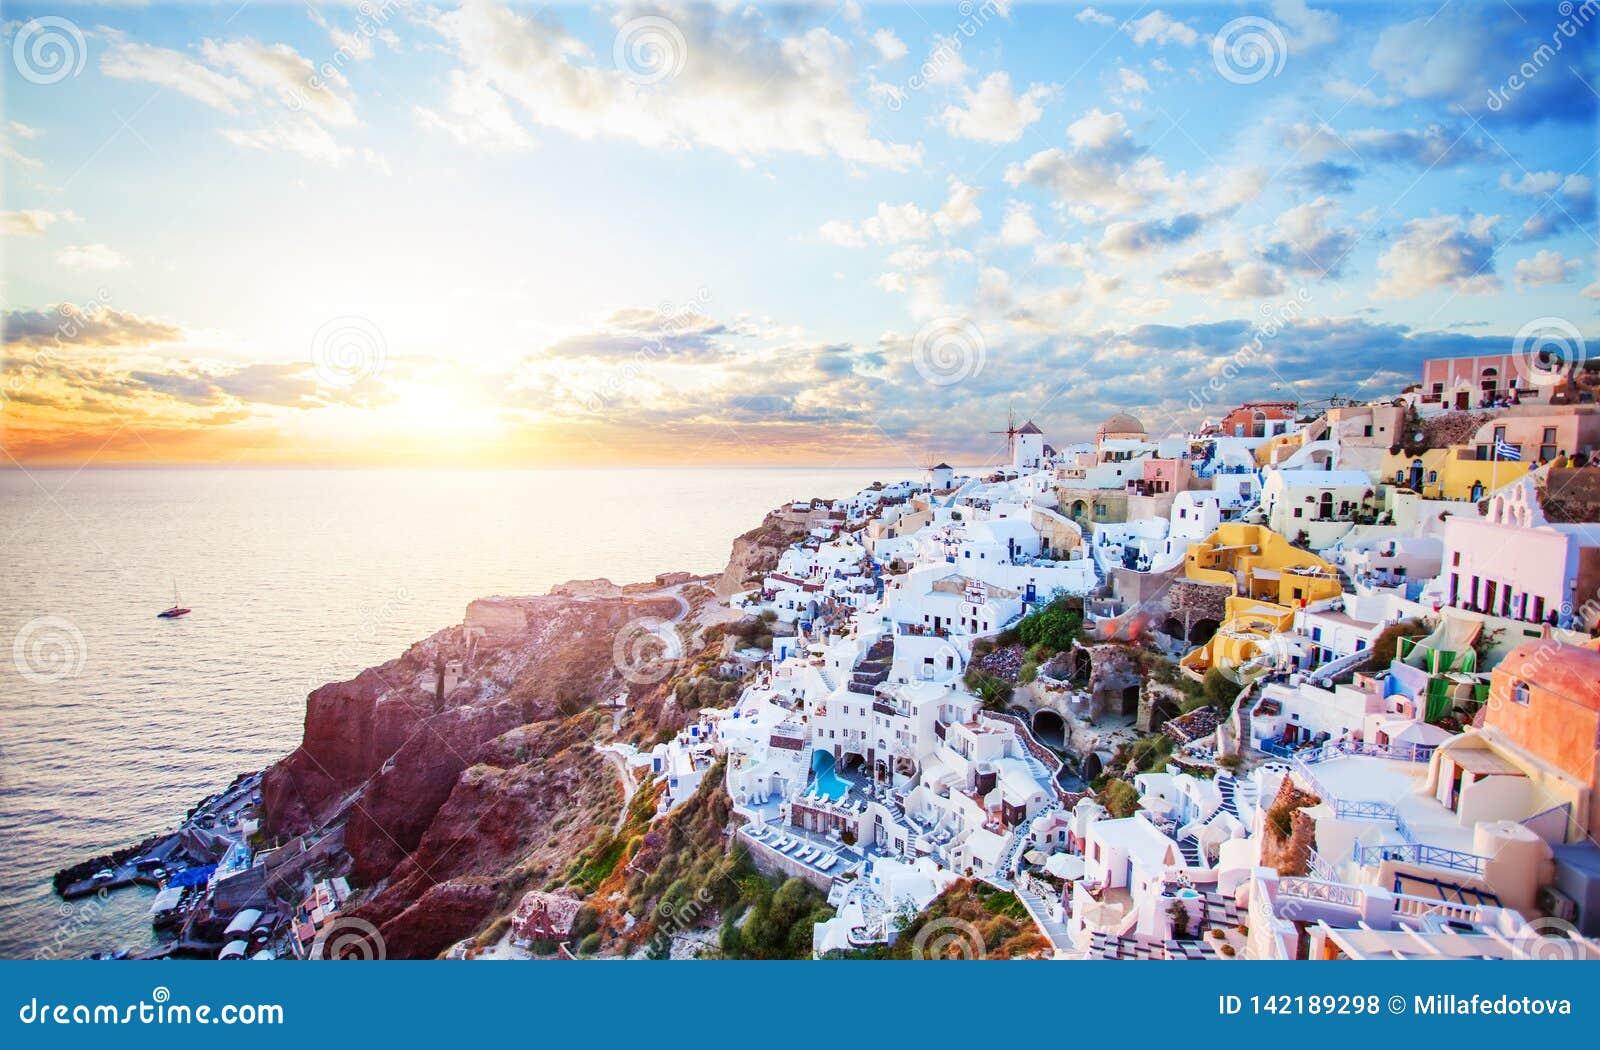 Beautiful Santorini island landscape with sea, sky and clouds. Oia town, Greece landmark